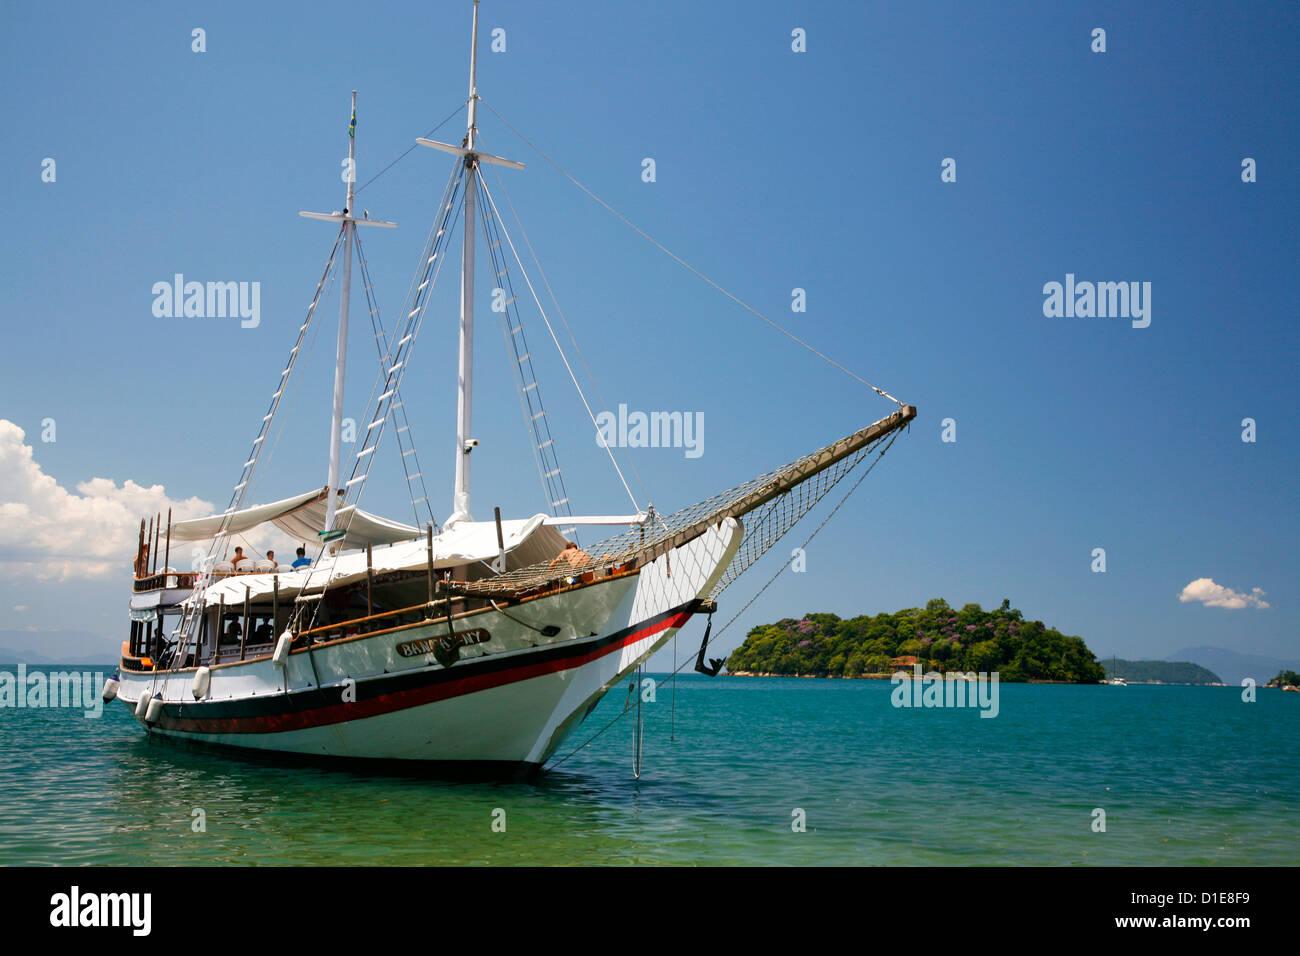 Schooner cruising between the different beaches and islands around Parati, Rio de Janeiro State, Brazil, South America - Stock Image